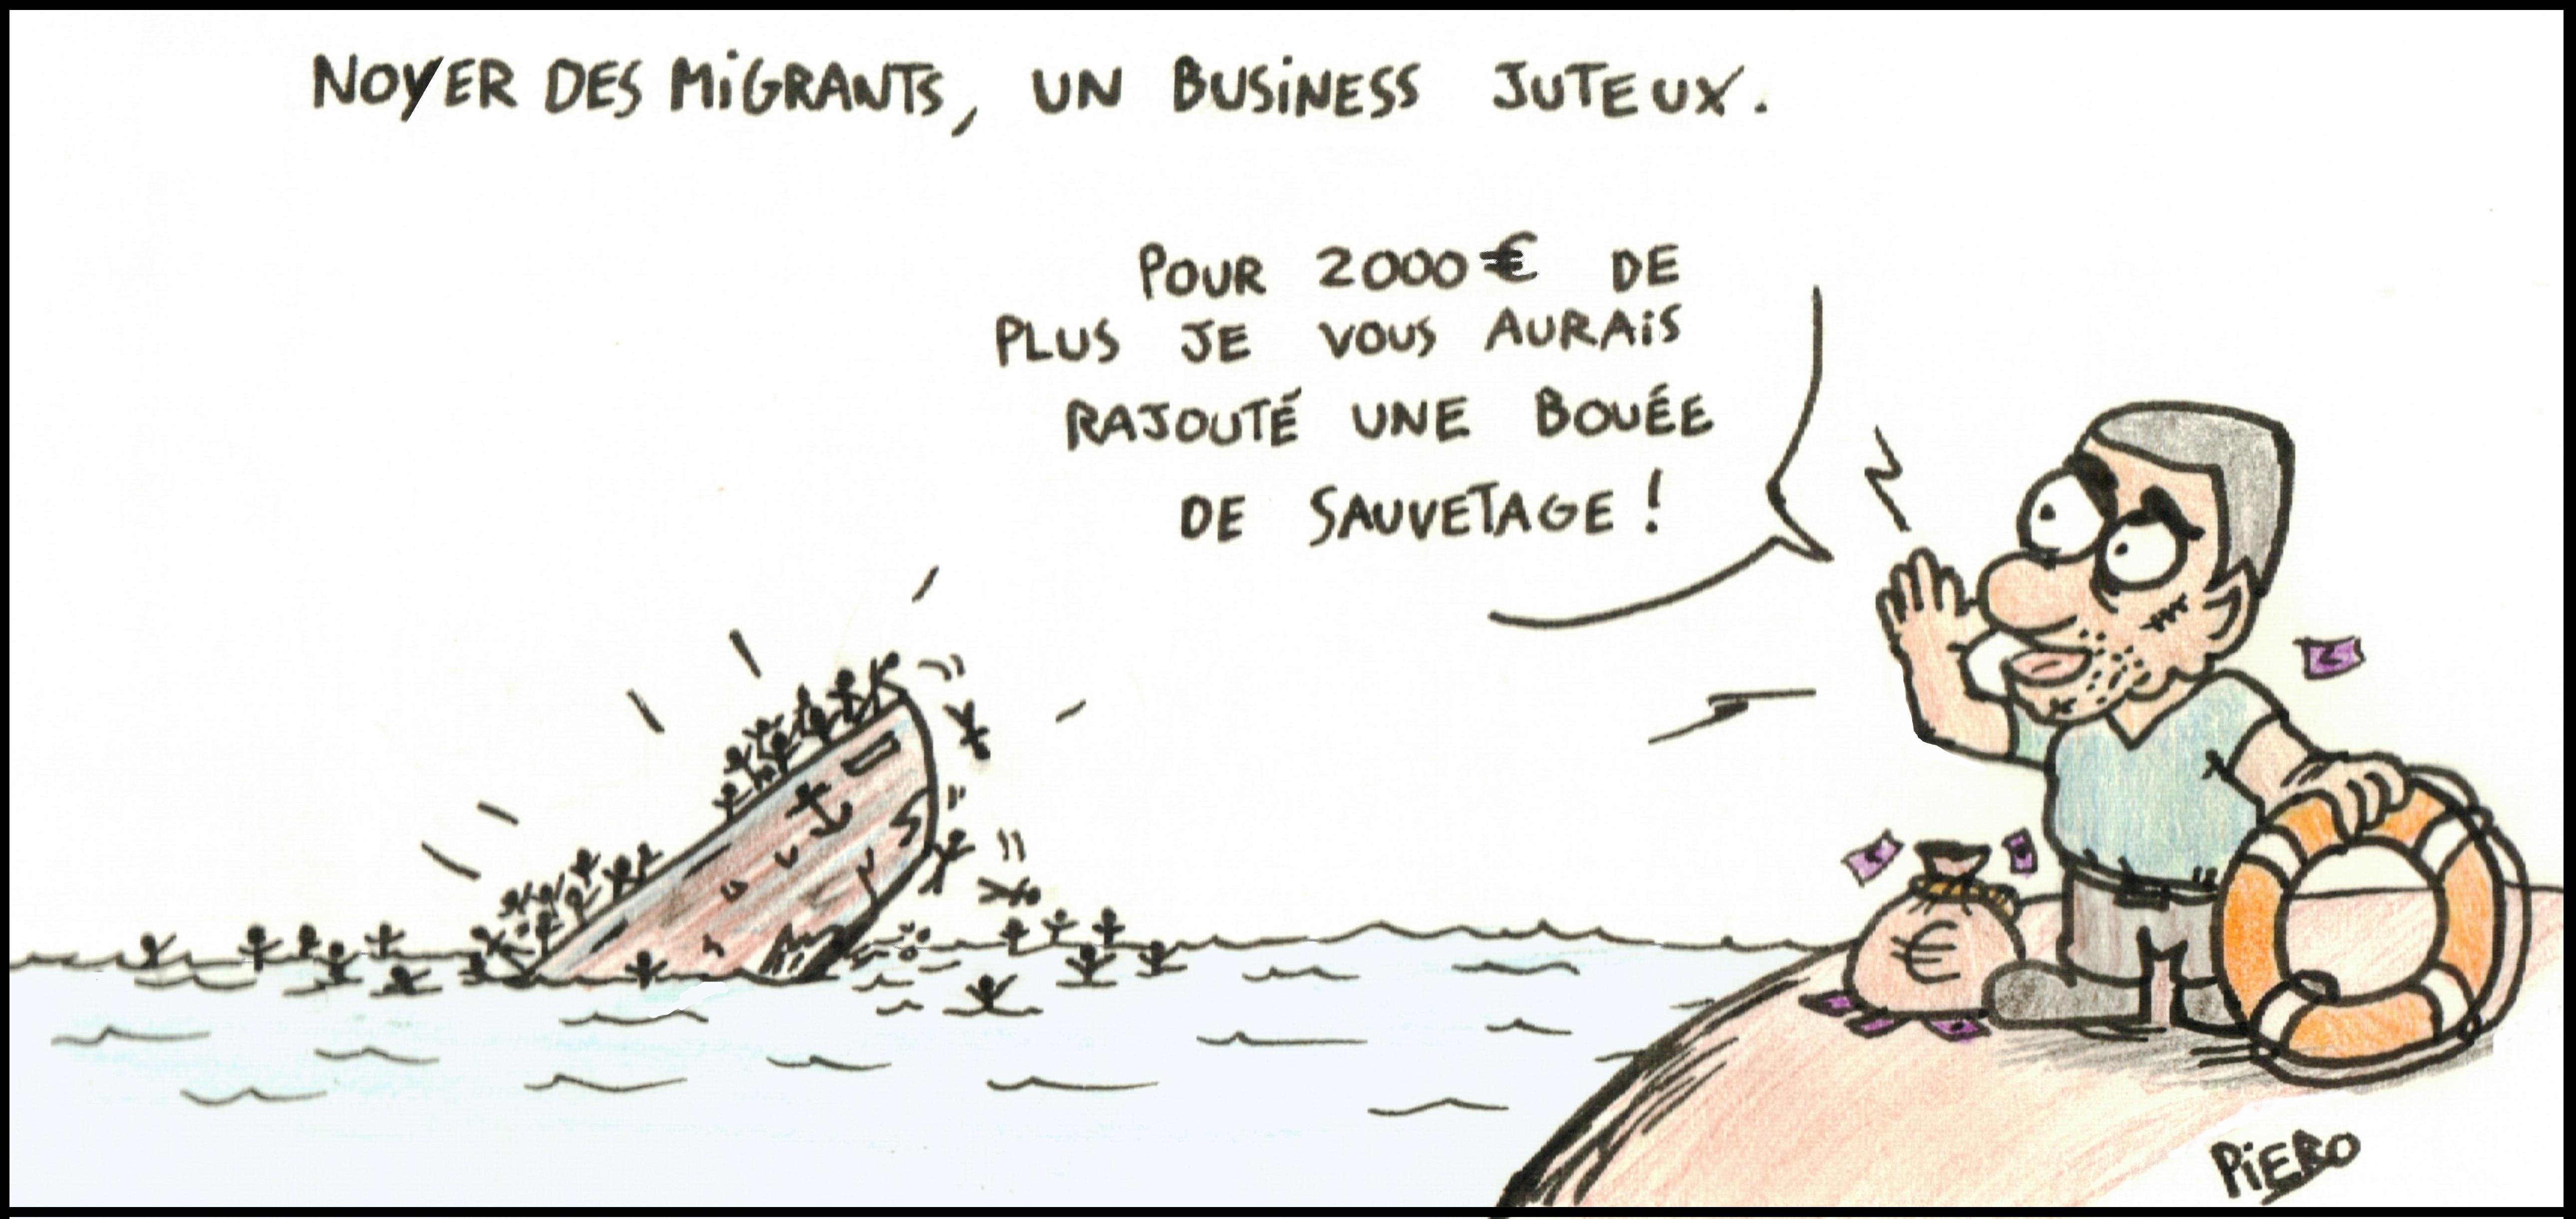 Crédit Pierre Corbel